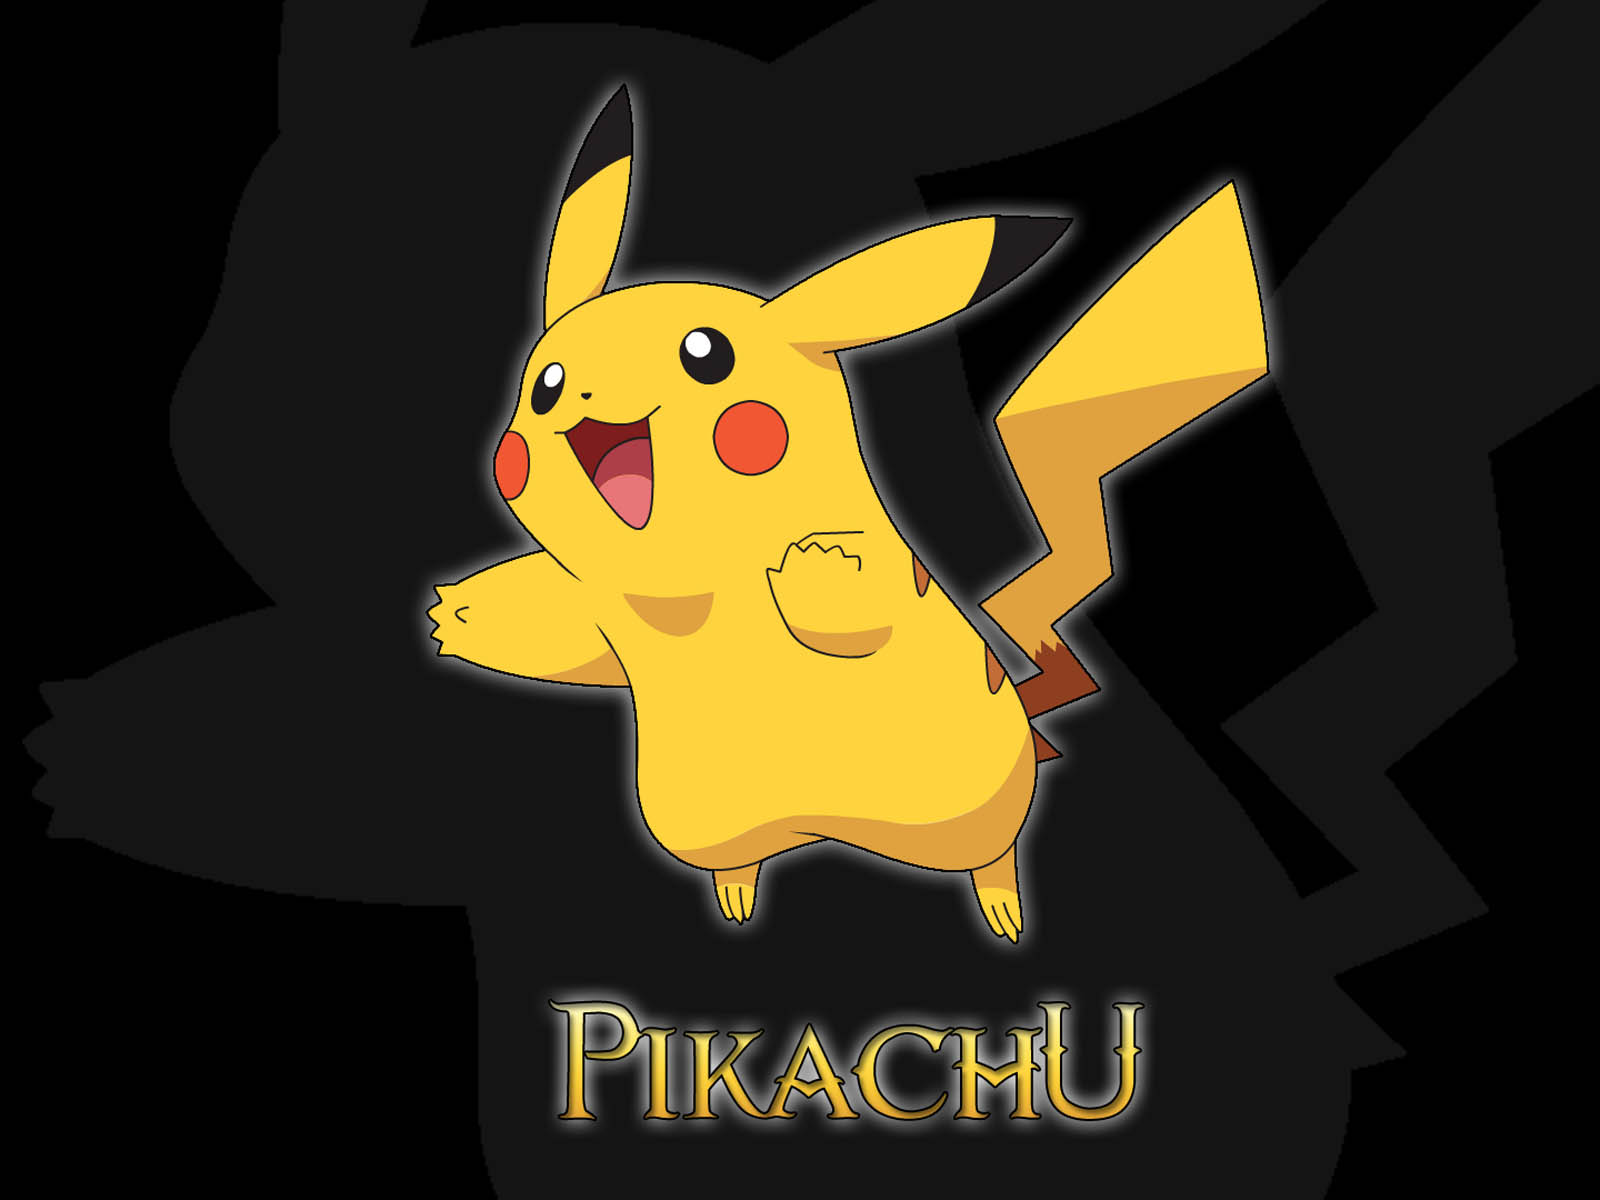 Pokemon Desktop Wallpapers Pikachu Pokemon Desktop Backgrounds 1600x1200